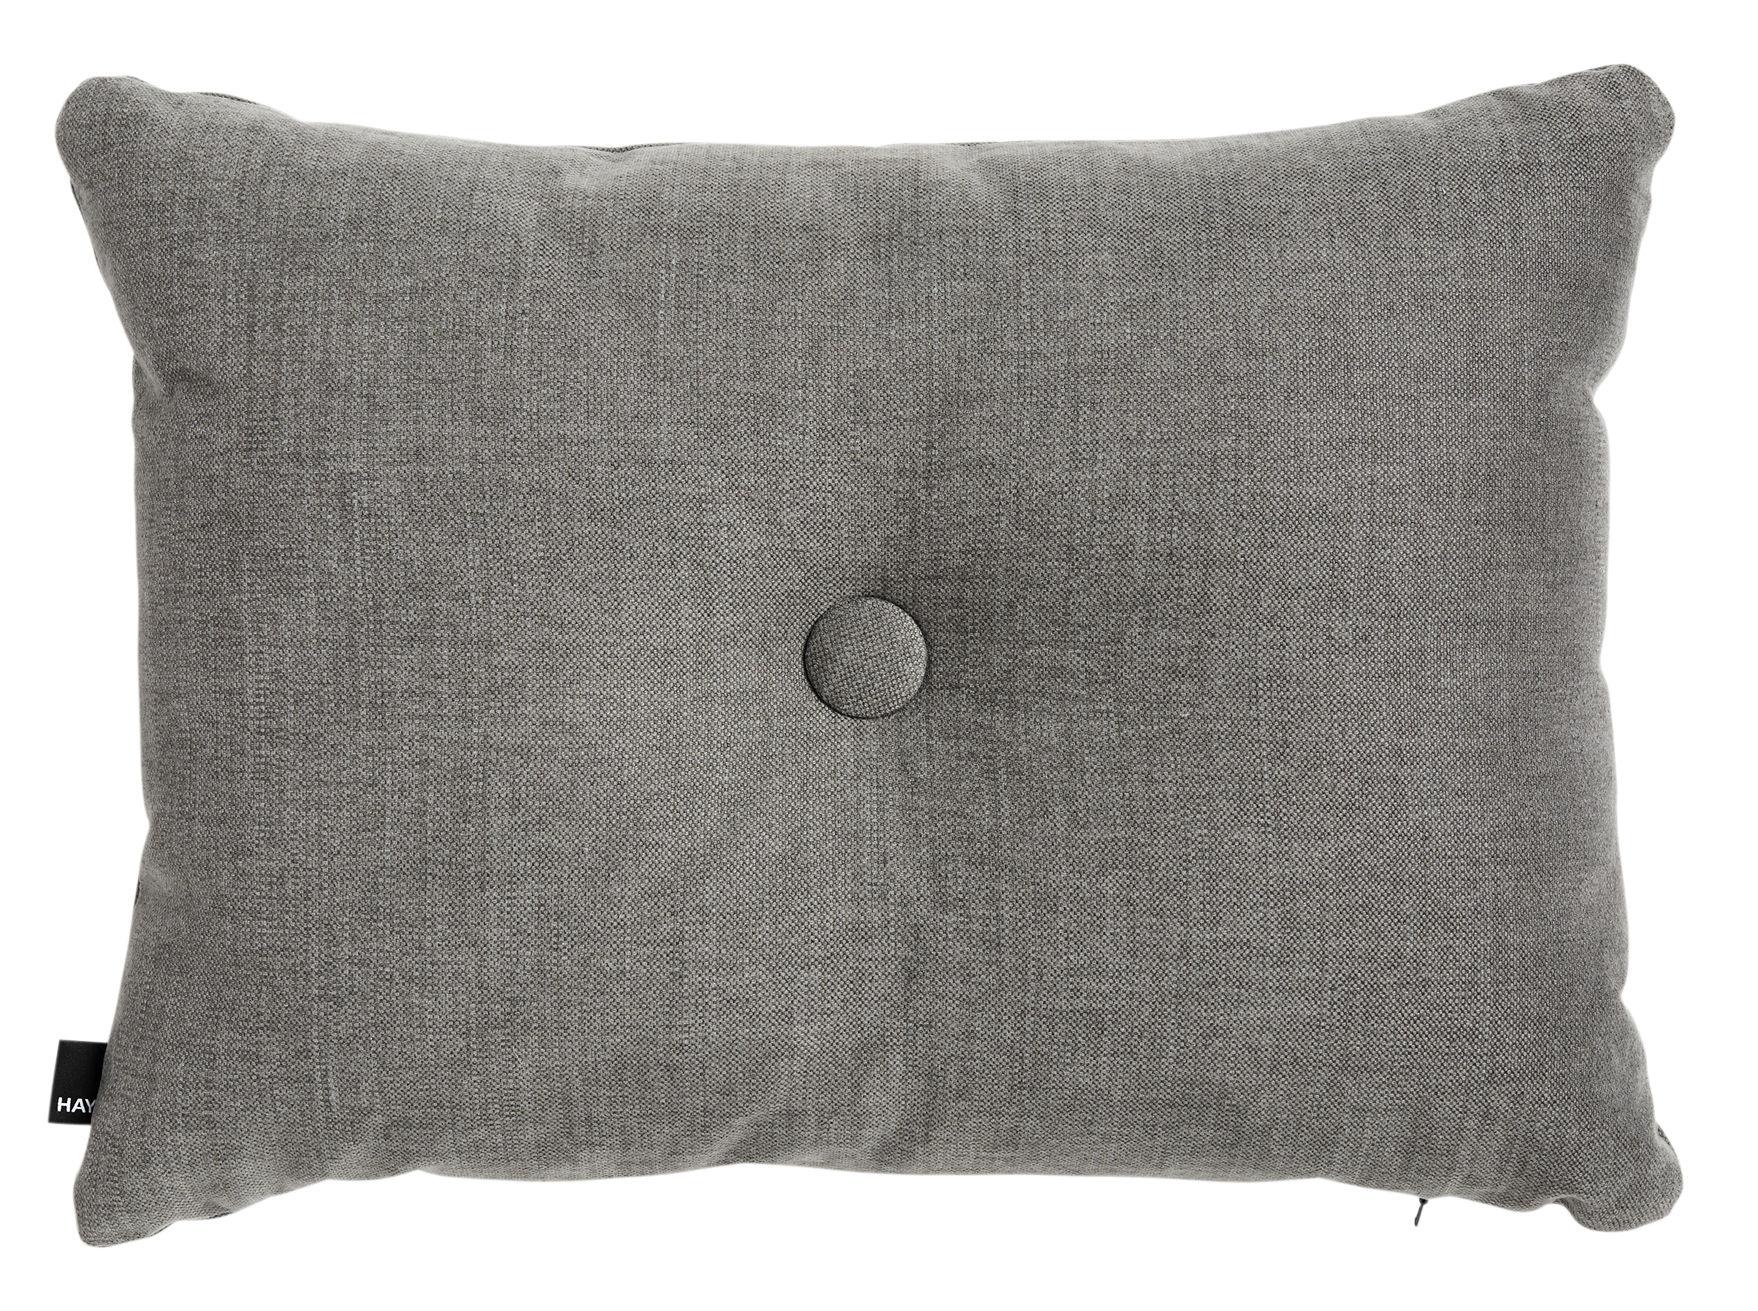 Decoration - Cushions & Poufs - Dot Tint Cushion - / 60 x 45 cm by Hay - Dark grey - Cotton, Linen